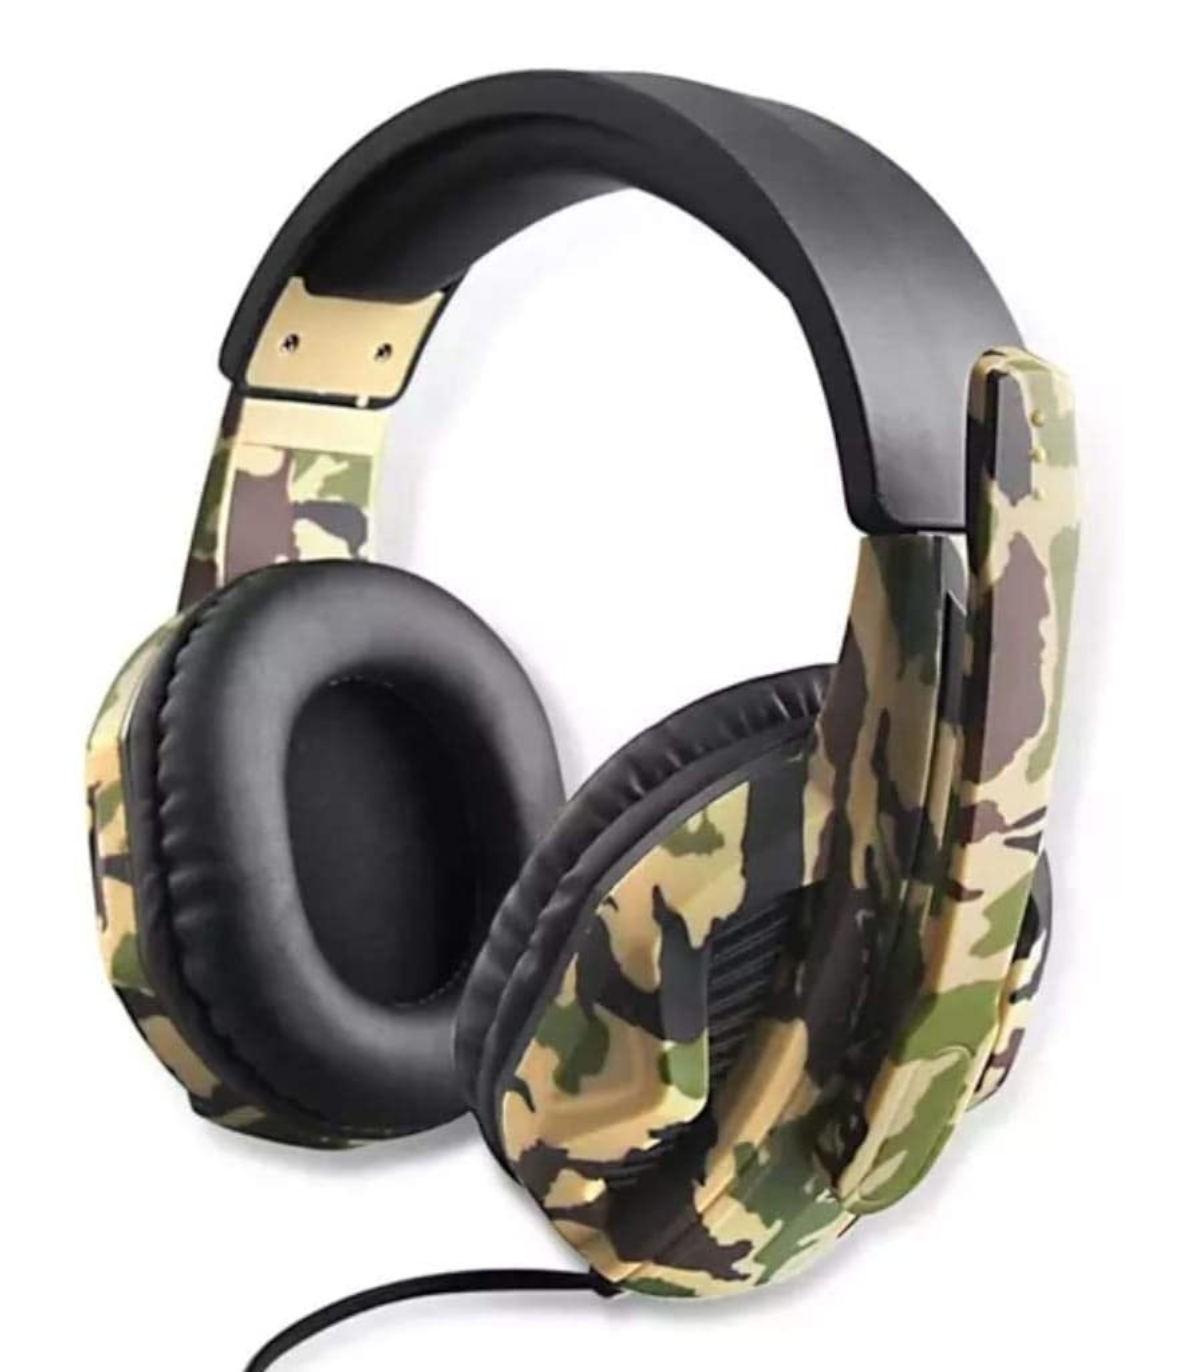 هدست OIVO Stereo High Power Bass با میکروفن طرح Army Green مدل